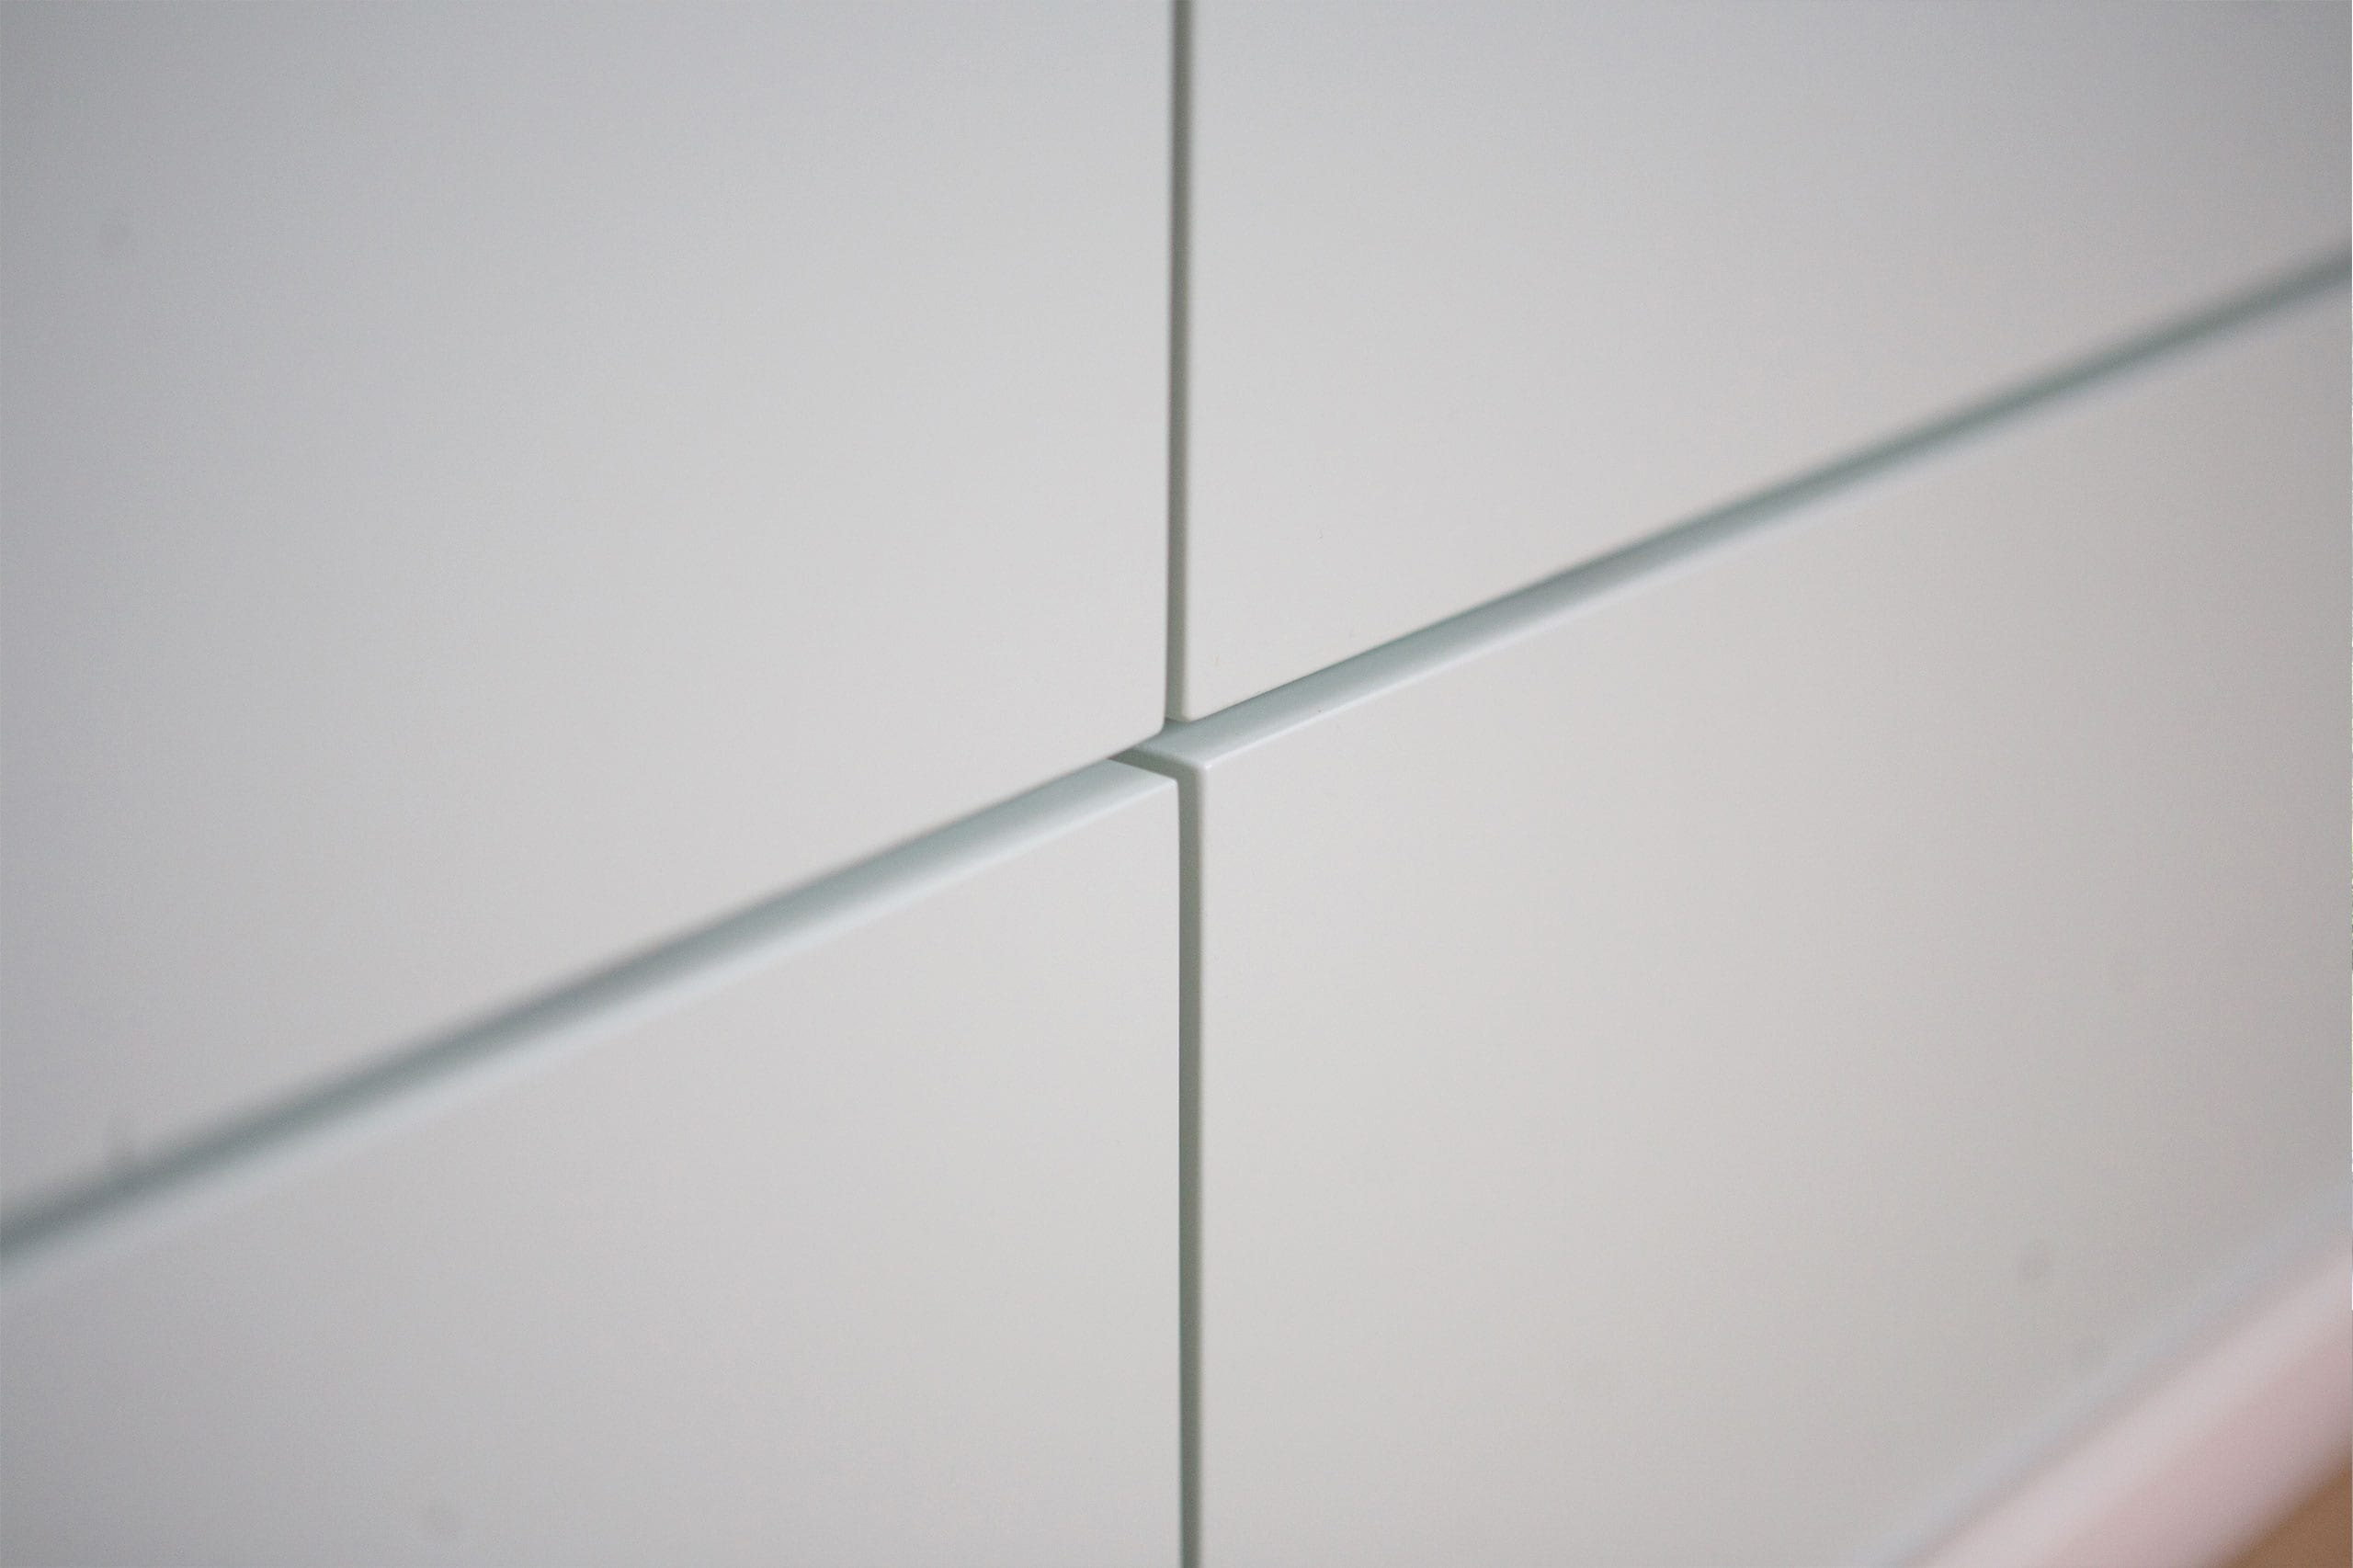 gespoten-dressoir-woonkamer-ontwerp-op-maat-1